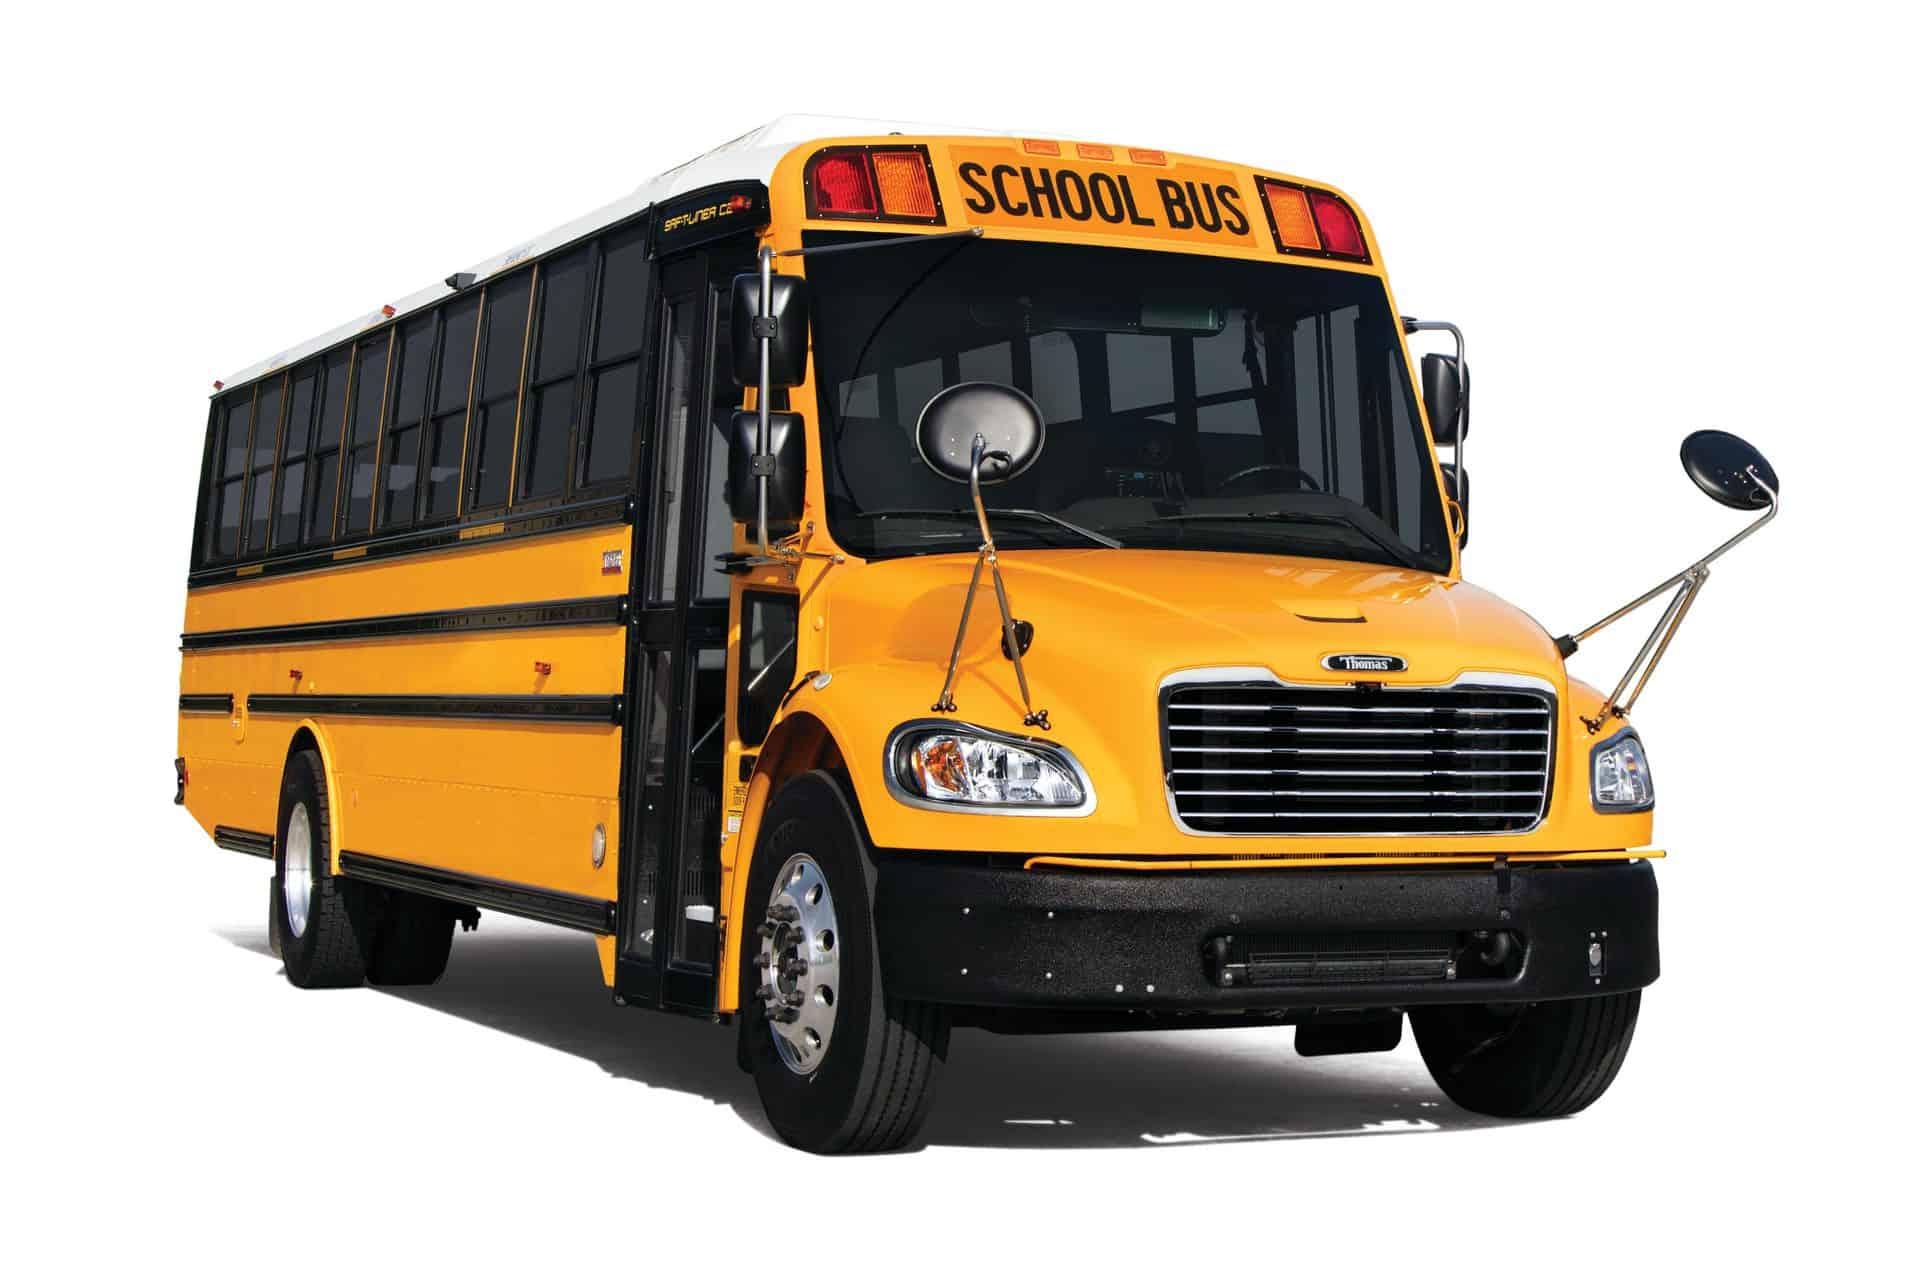 Thomas Built Buses >> Thomas Built Buses Receives World Class Net Promoter Score Again